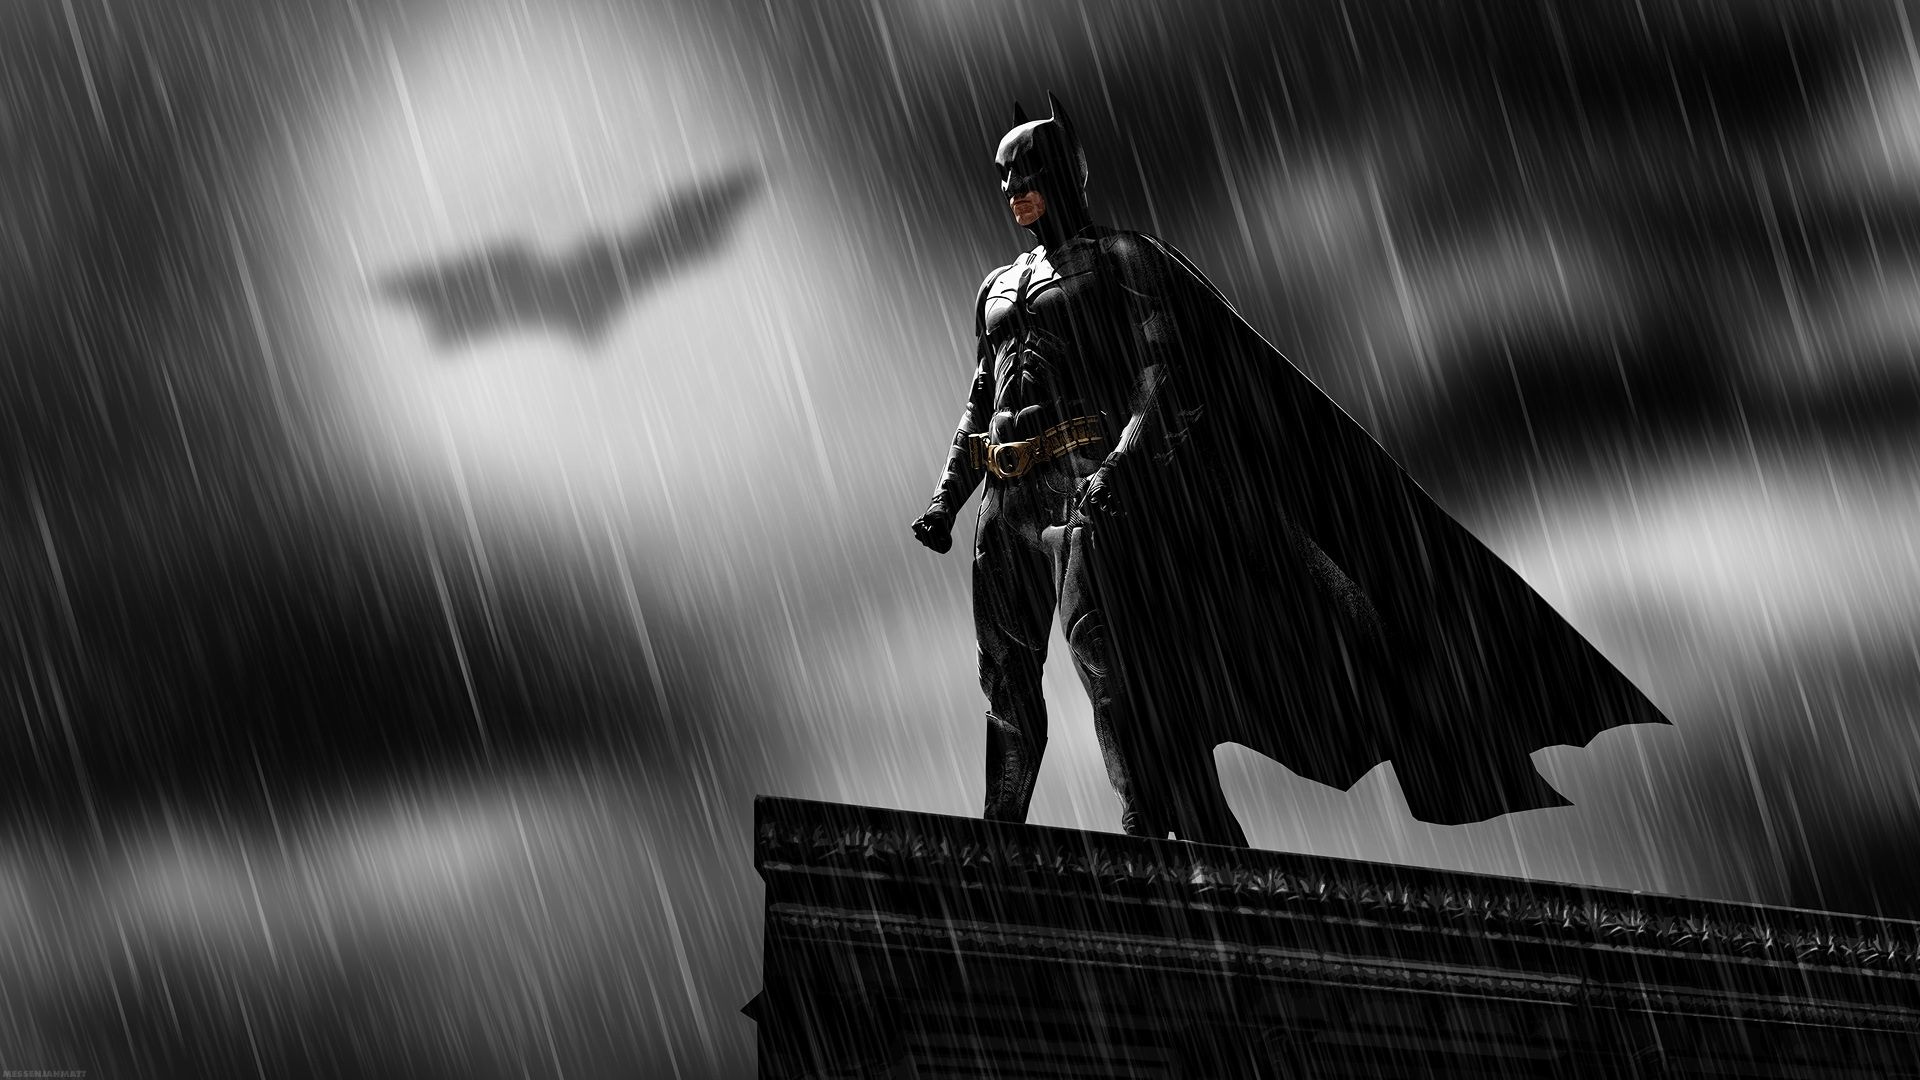 Wallpapers Desktop Knight Batman Pauljorg Albums Choppers Dark Wallpaper Batman Wallpaper Batman Backgrounds Batman Dark Batman dark knight wallpaper hd 1080p